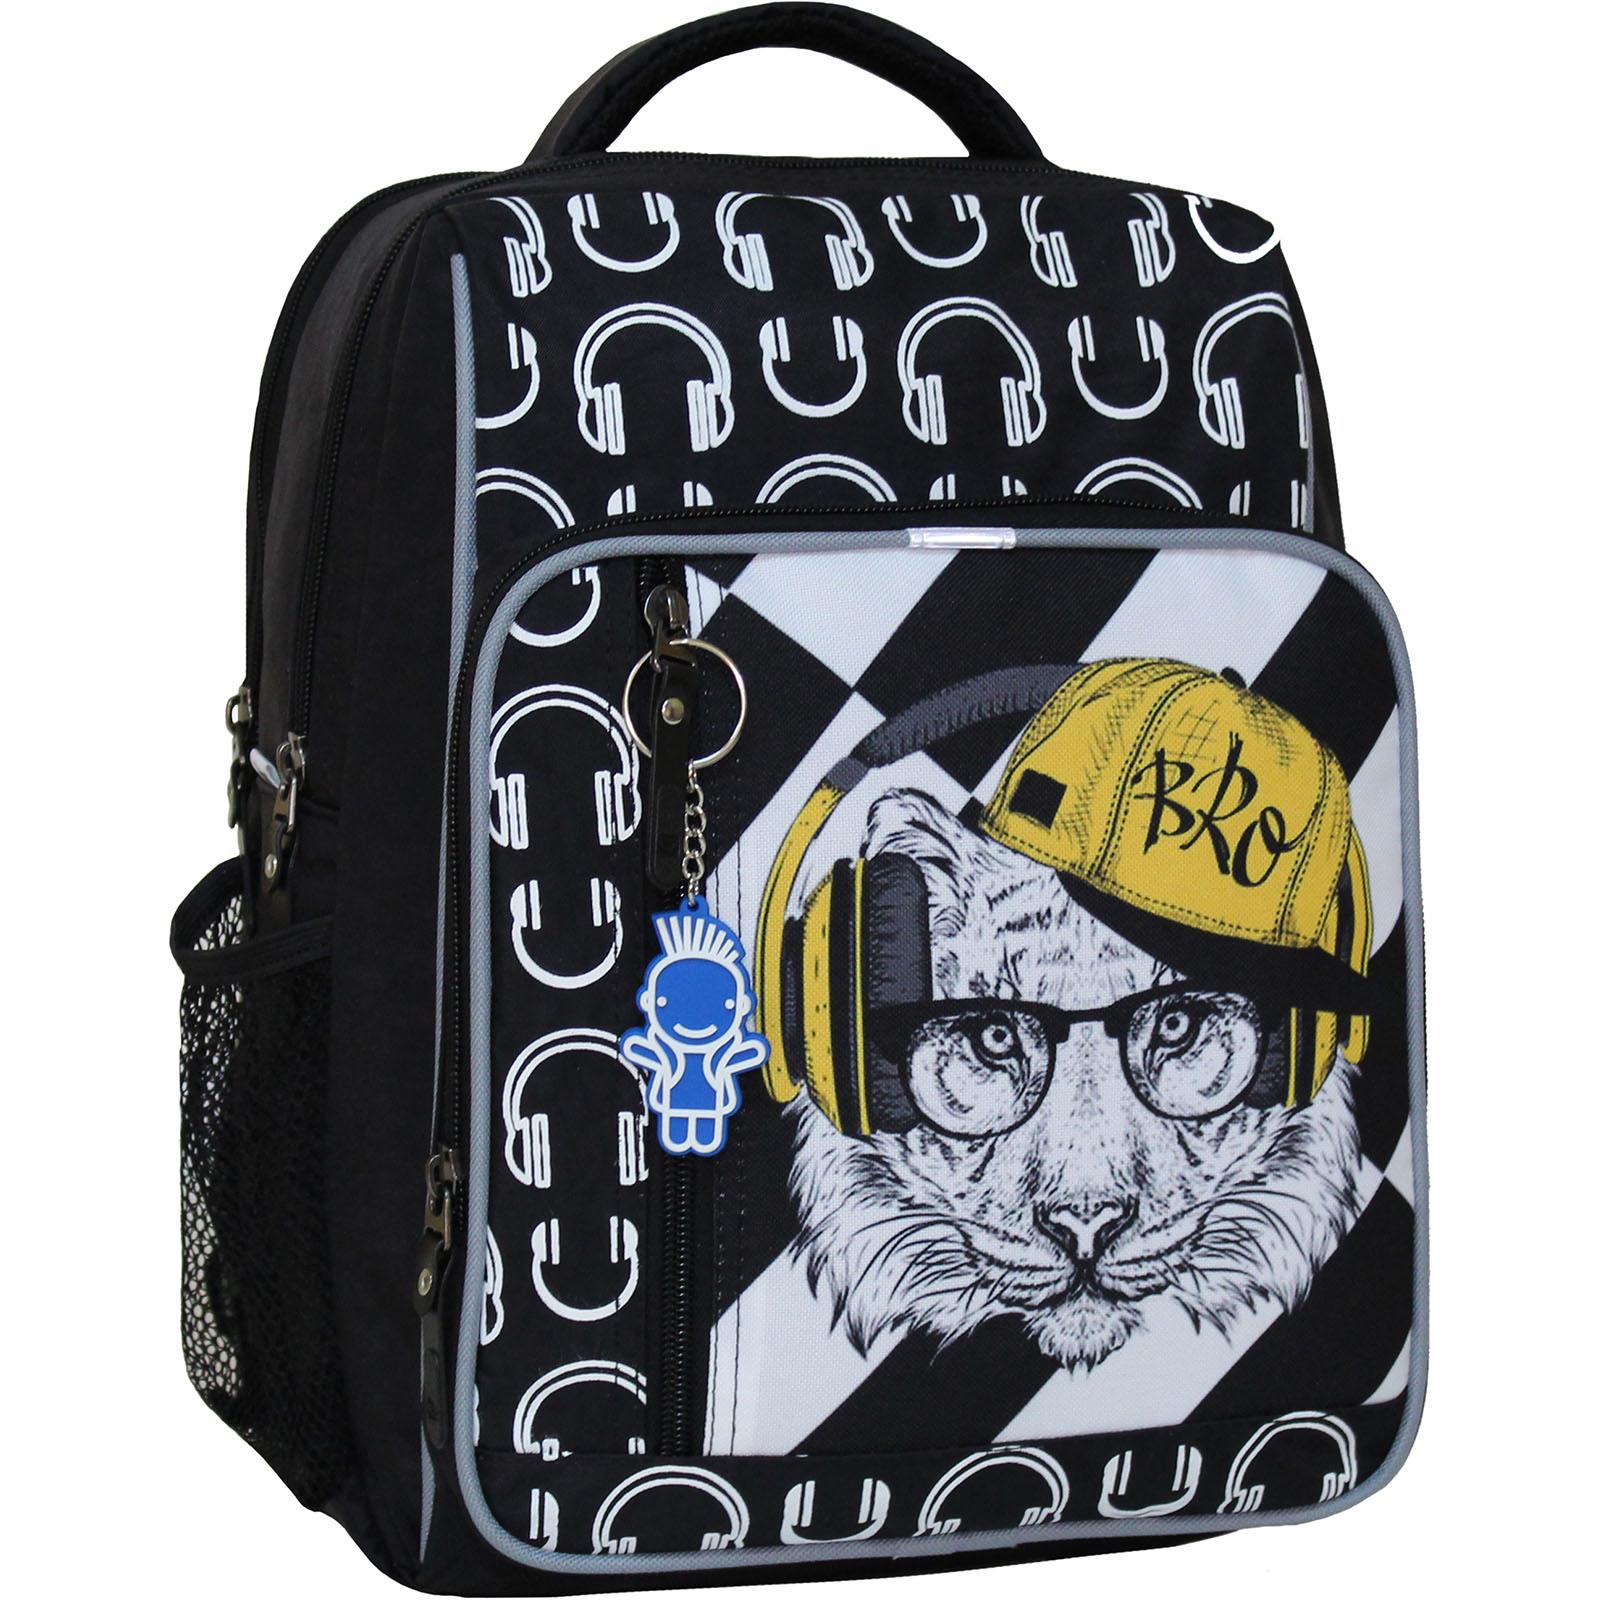 Школьные рюкзаки Рюкзак школьный Bagland Школьник 8 л. черный 175к (0012870) IMG_6553_175к_.JPG